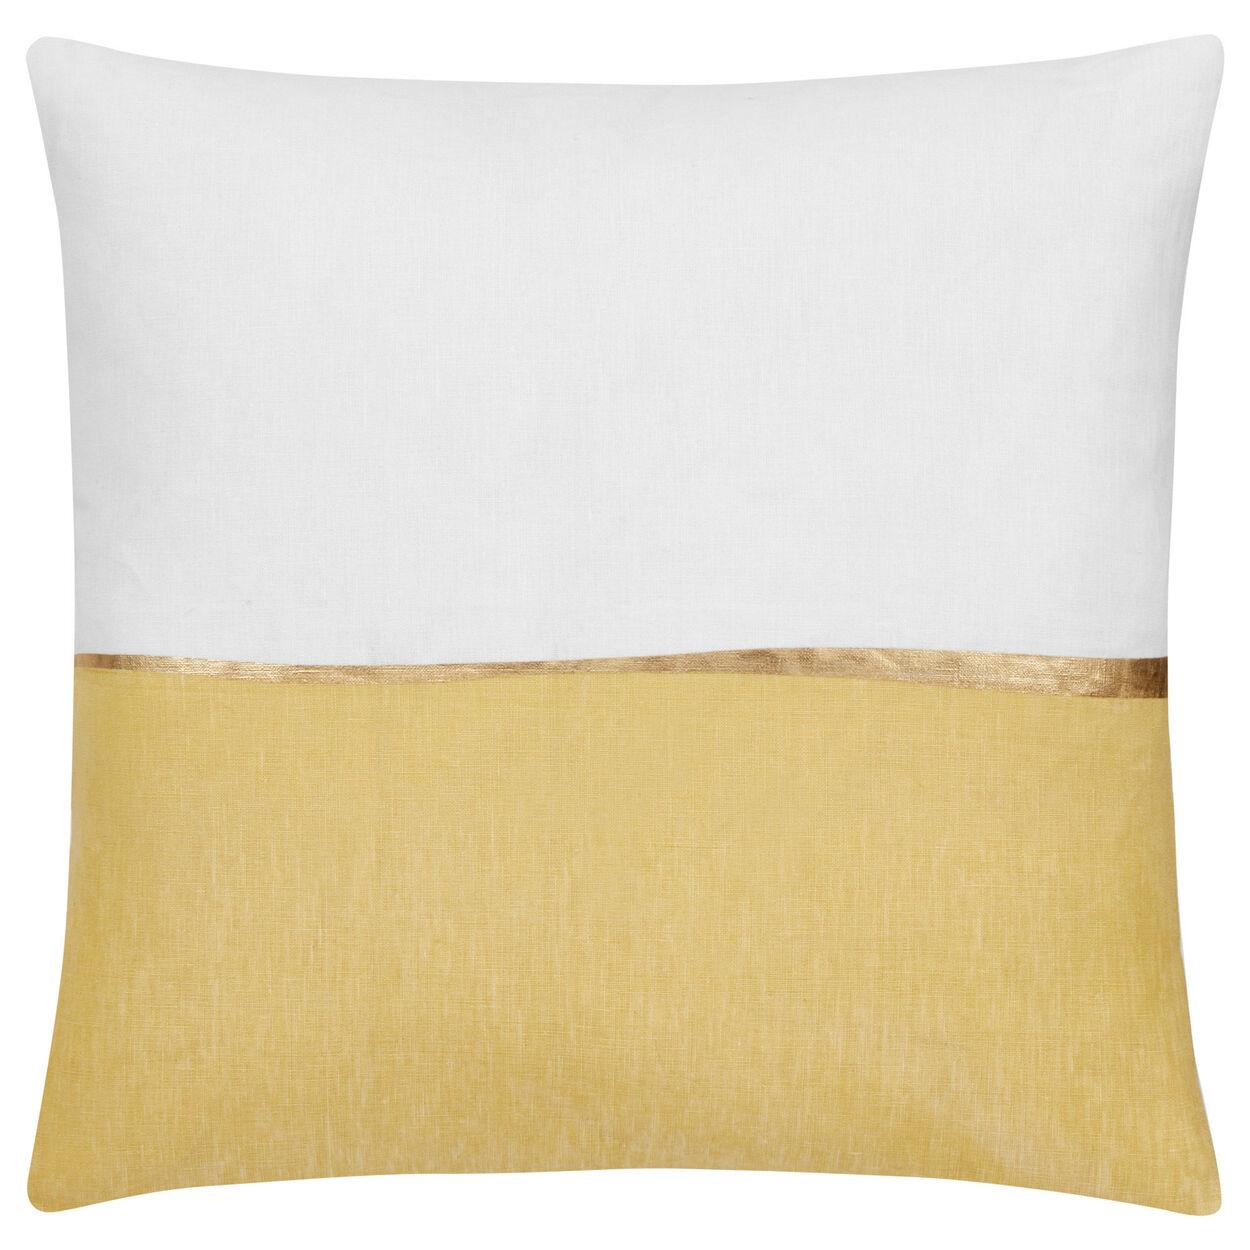 "Oubli Decorative Pillow with Foil Embellishment 20"" X 20"""